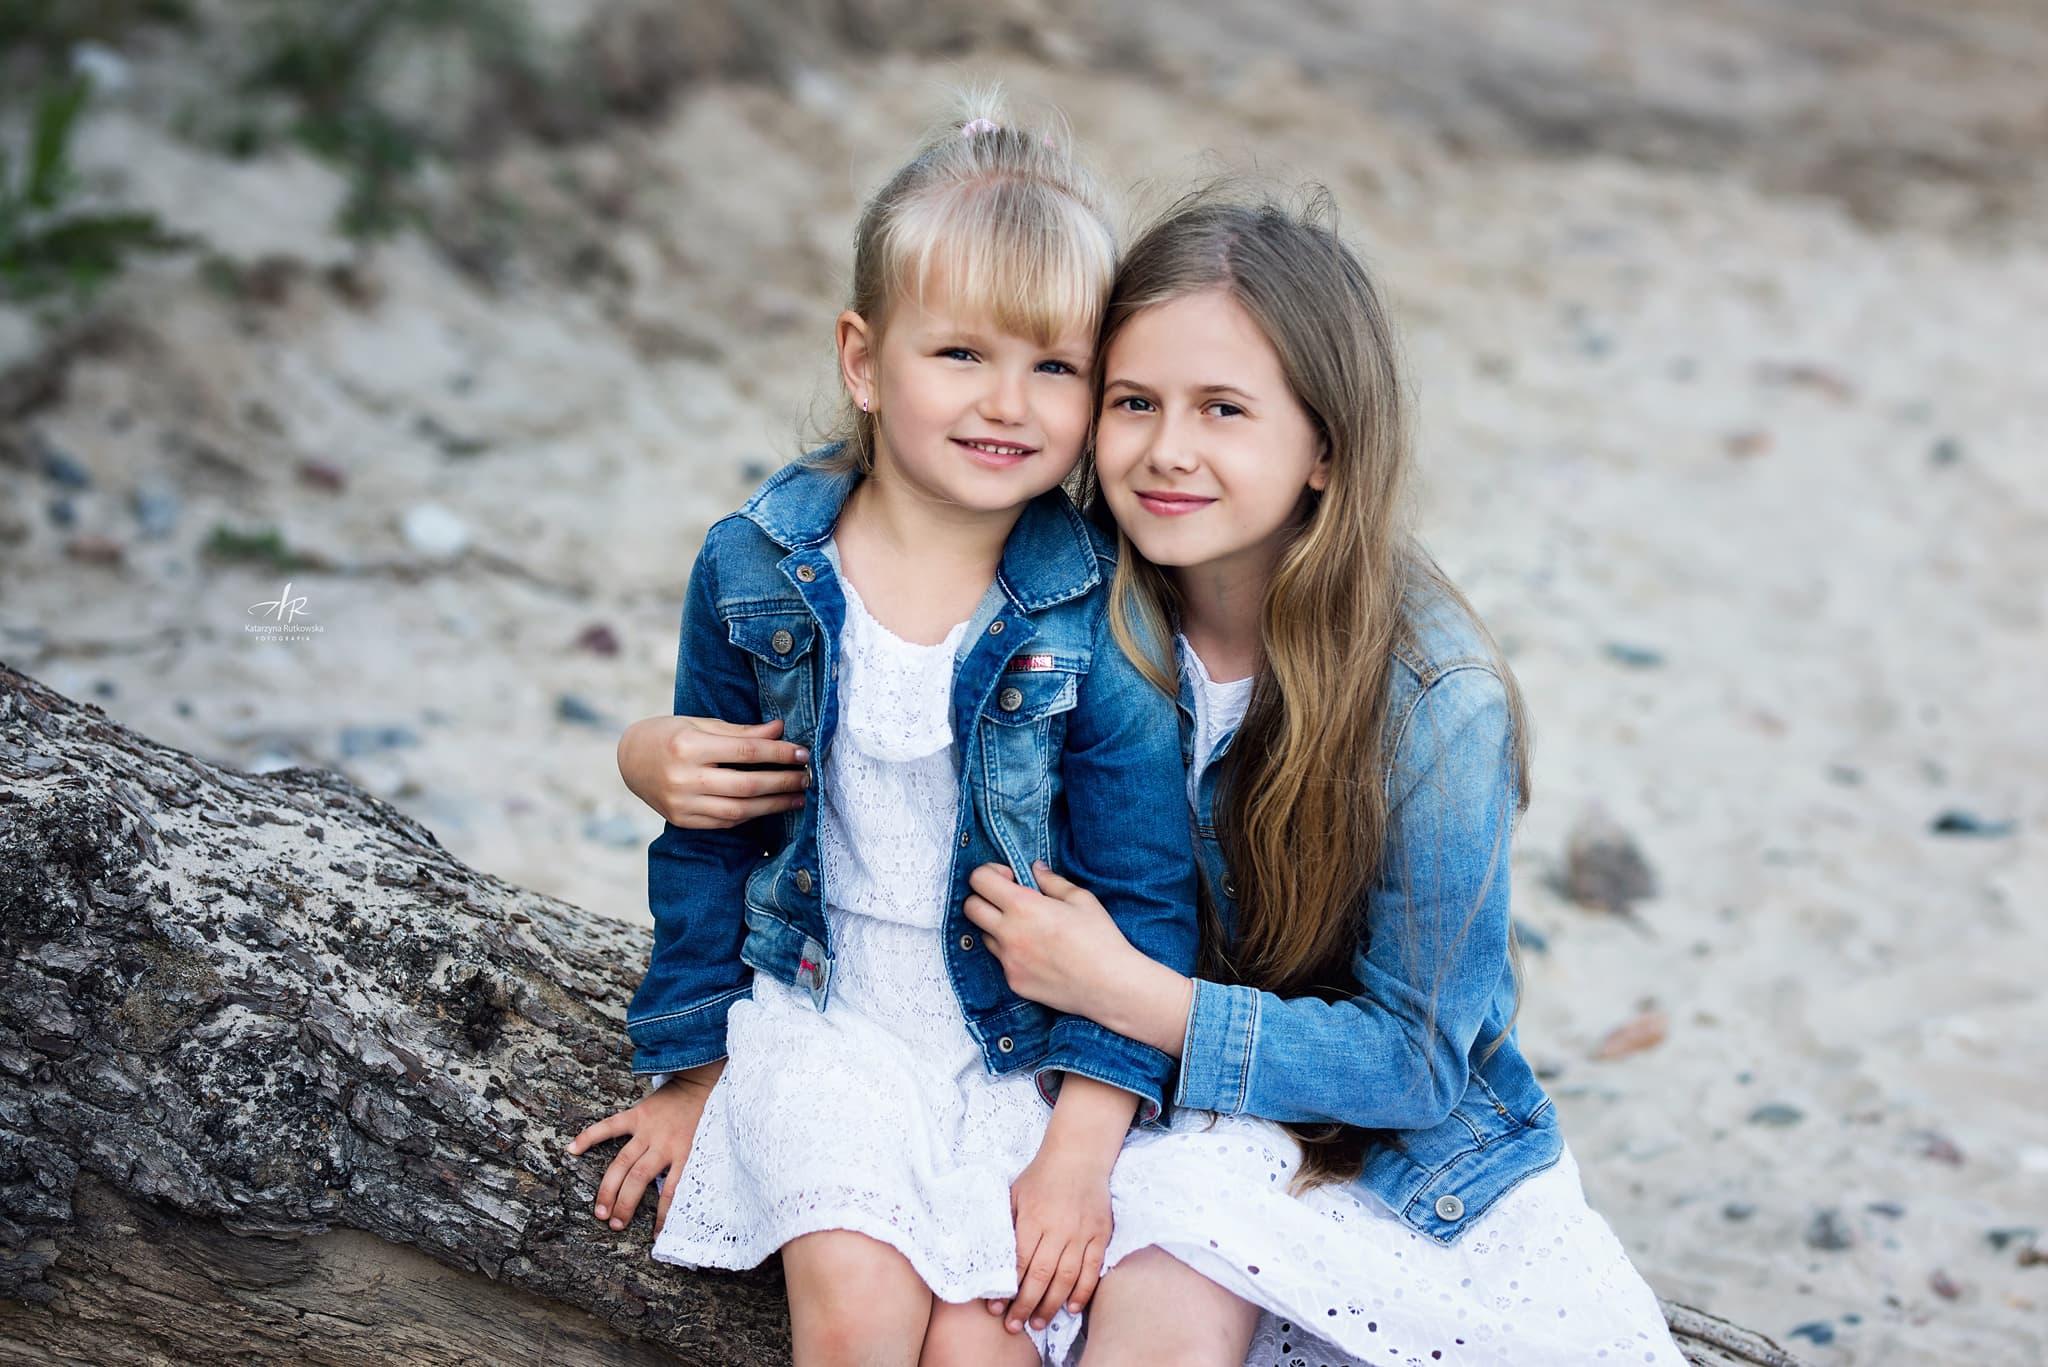 Siostry na plaży